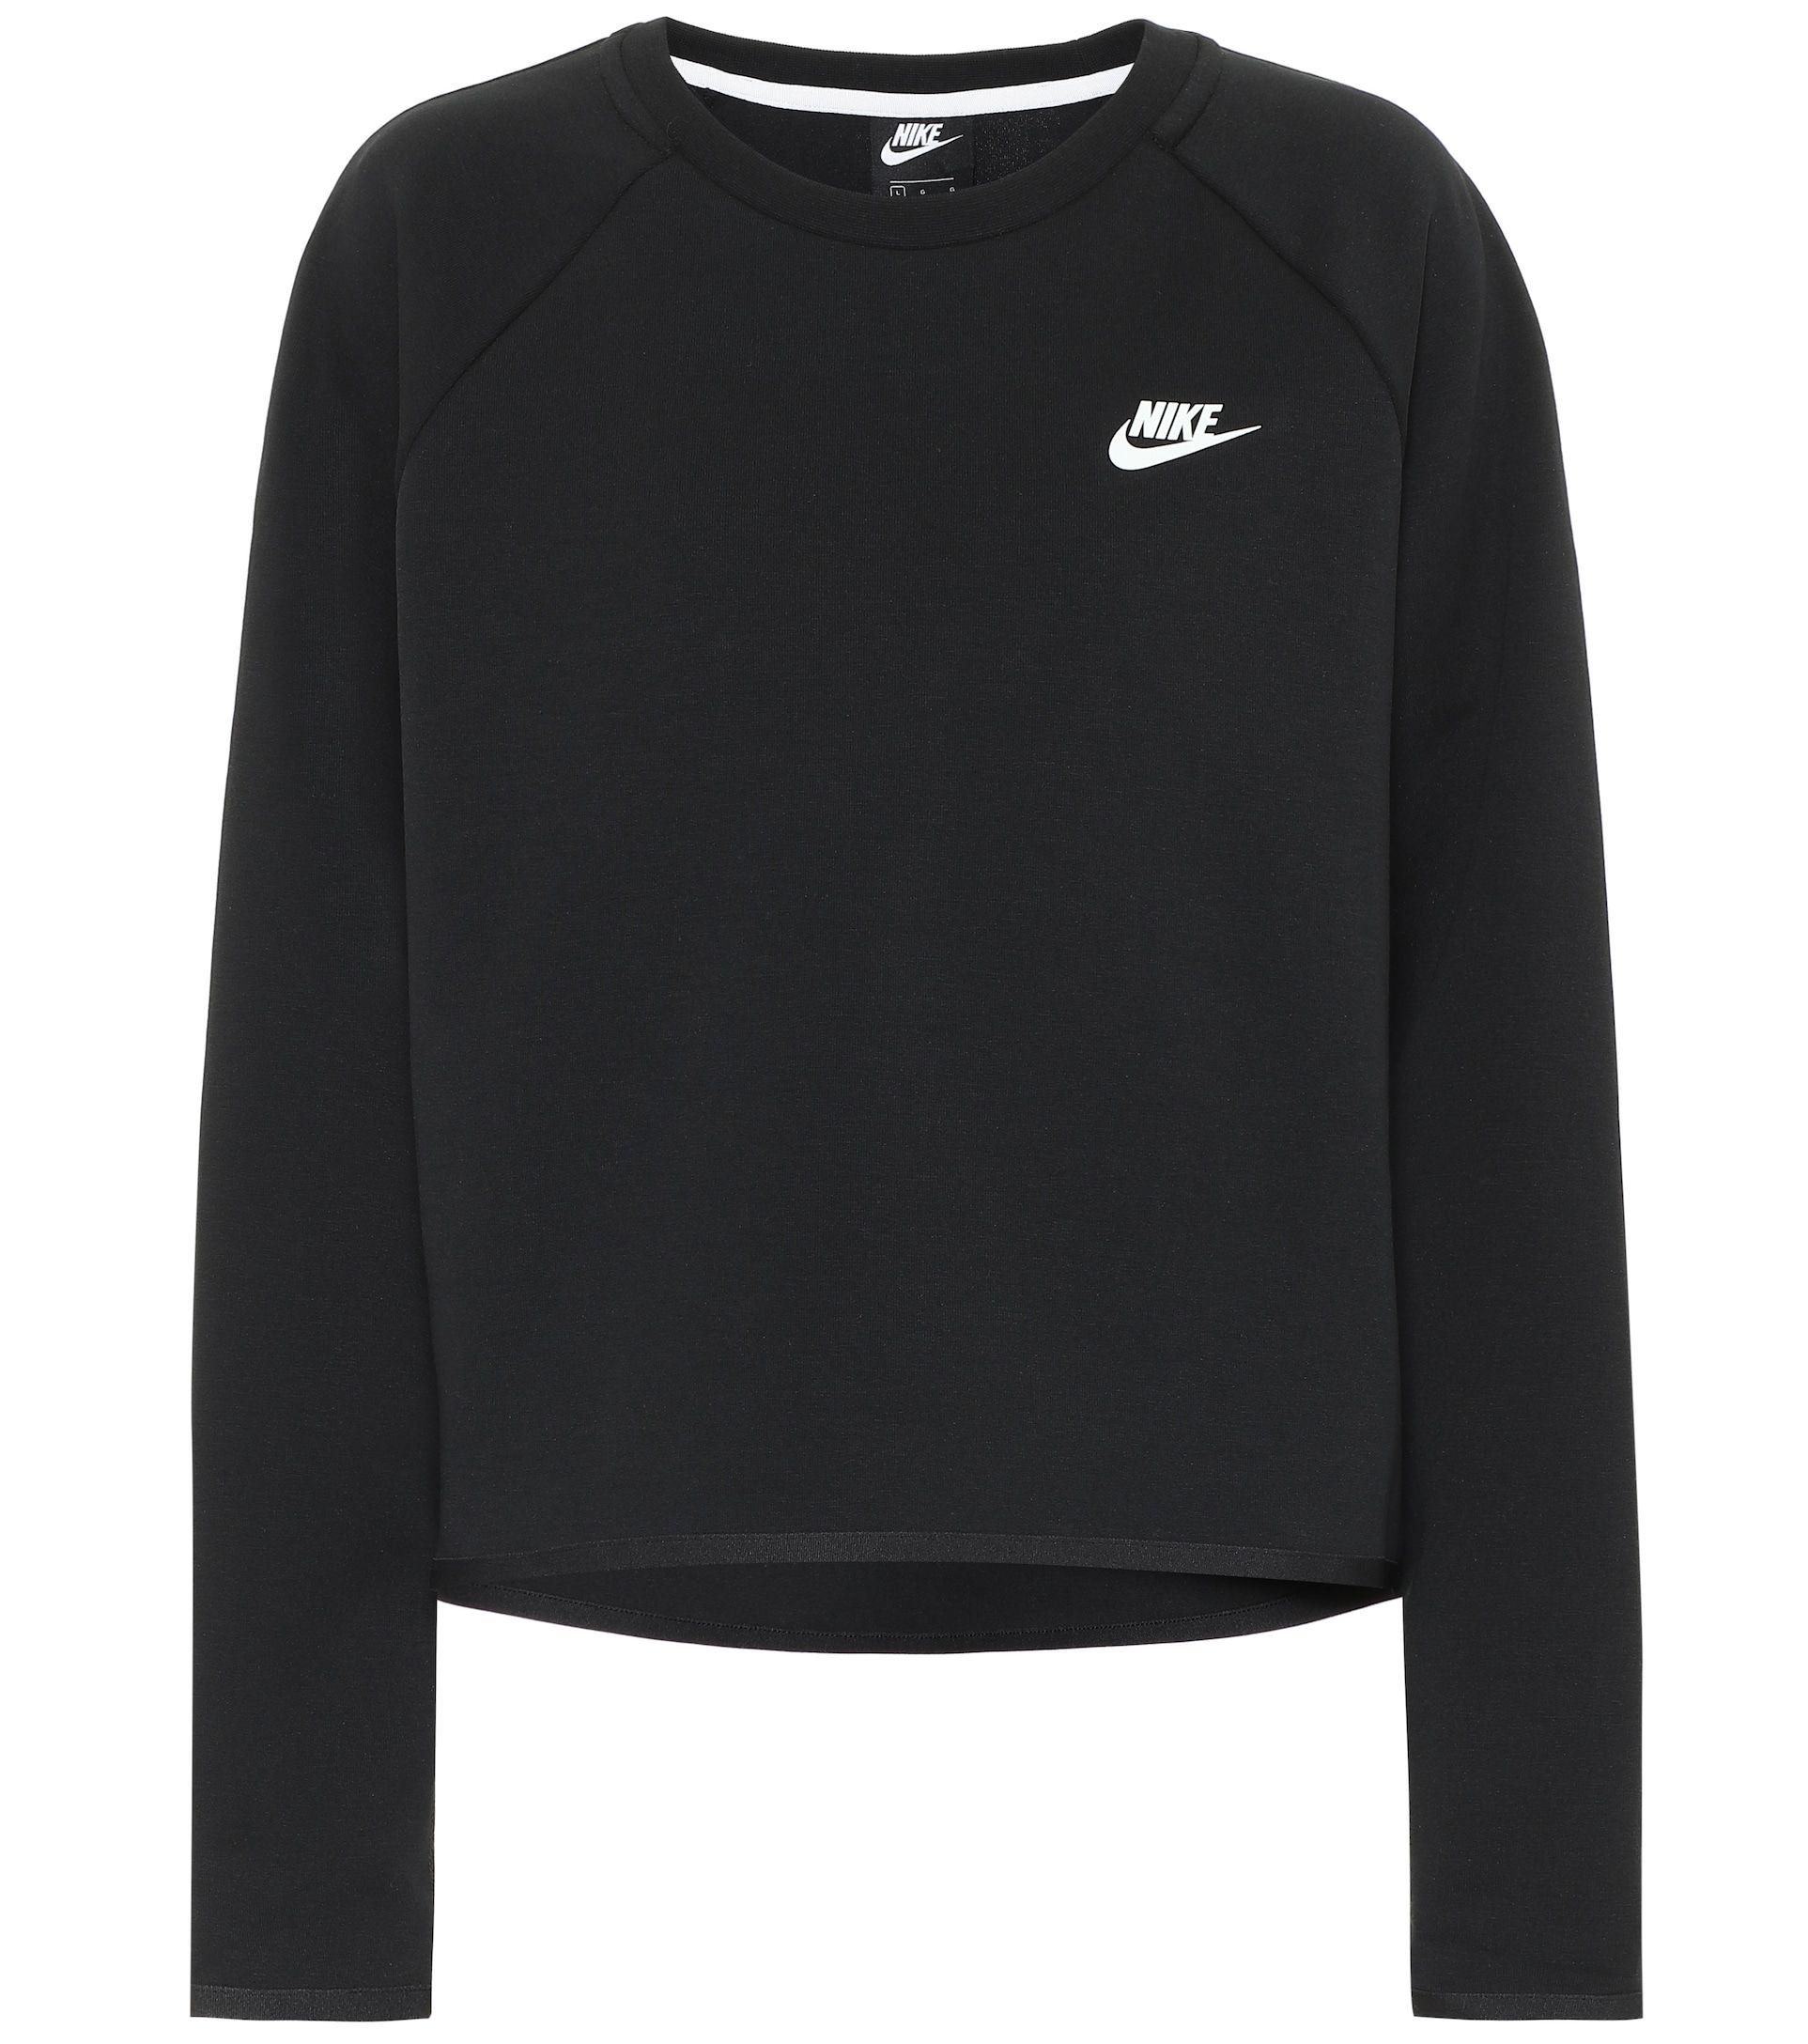 Cotton Blend Sweatshirt Nike Mytheresa Sweatshirts Clothes Cotton Hoodie [ 2176 x 1925 Pixel ]